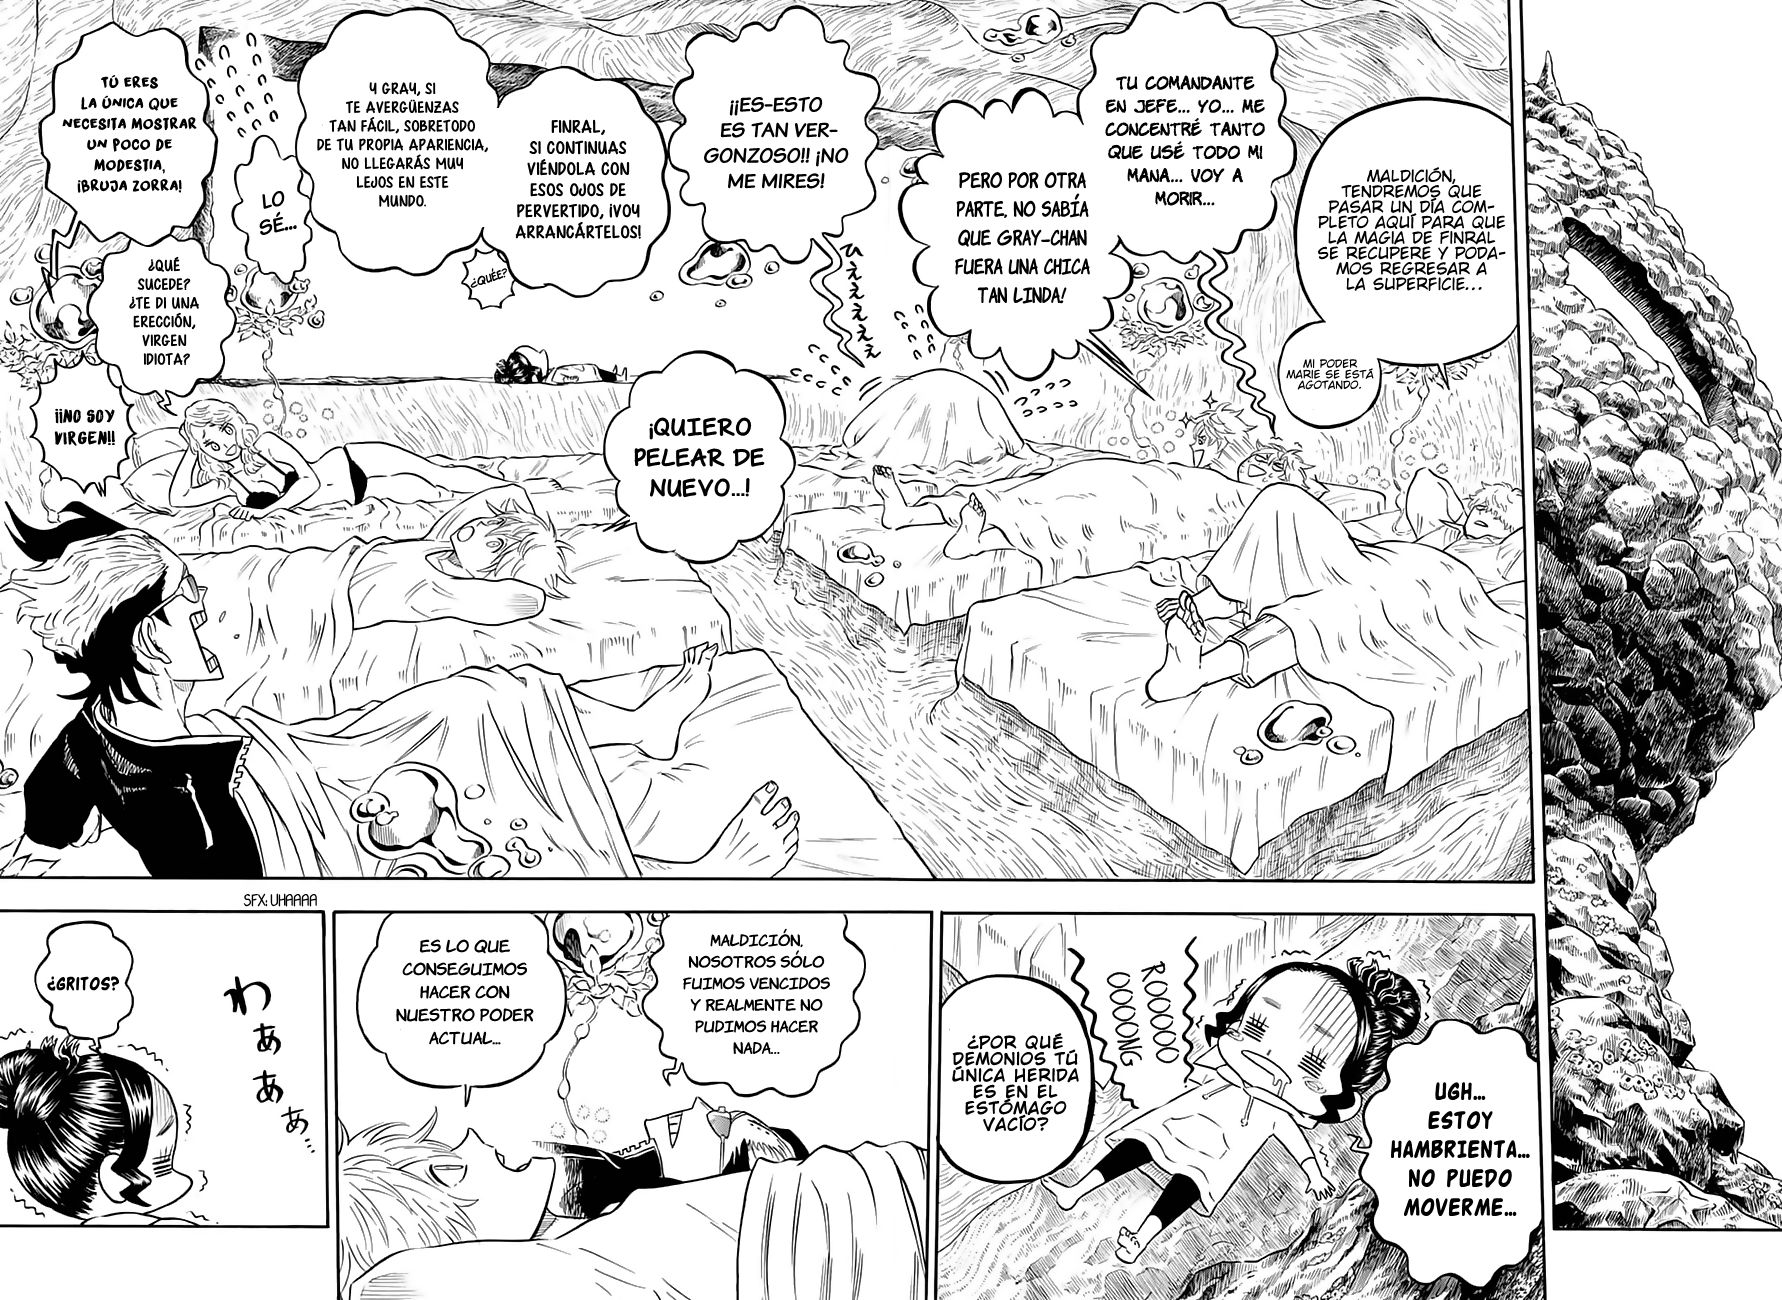 https://c5.ninemanga.com/es_manga/pic2/35/3811/488644/996a7121b7bfa4c1754abbf8d46405af.jpg Page 7